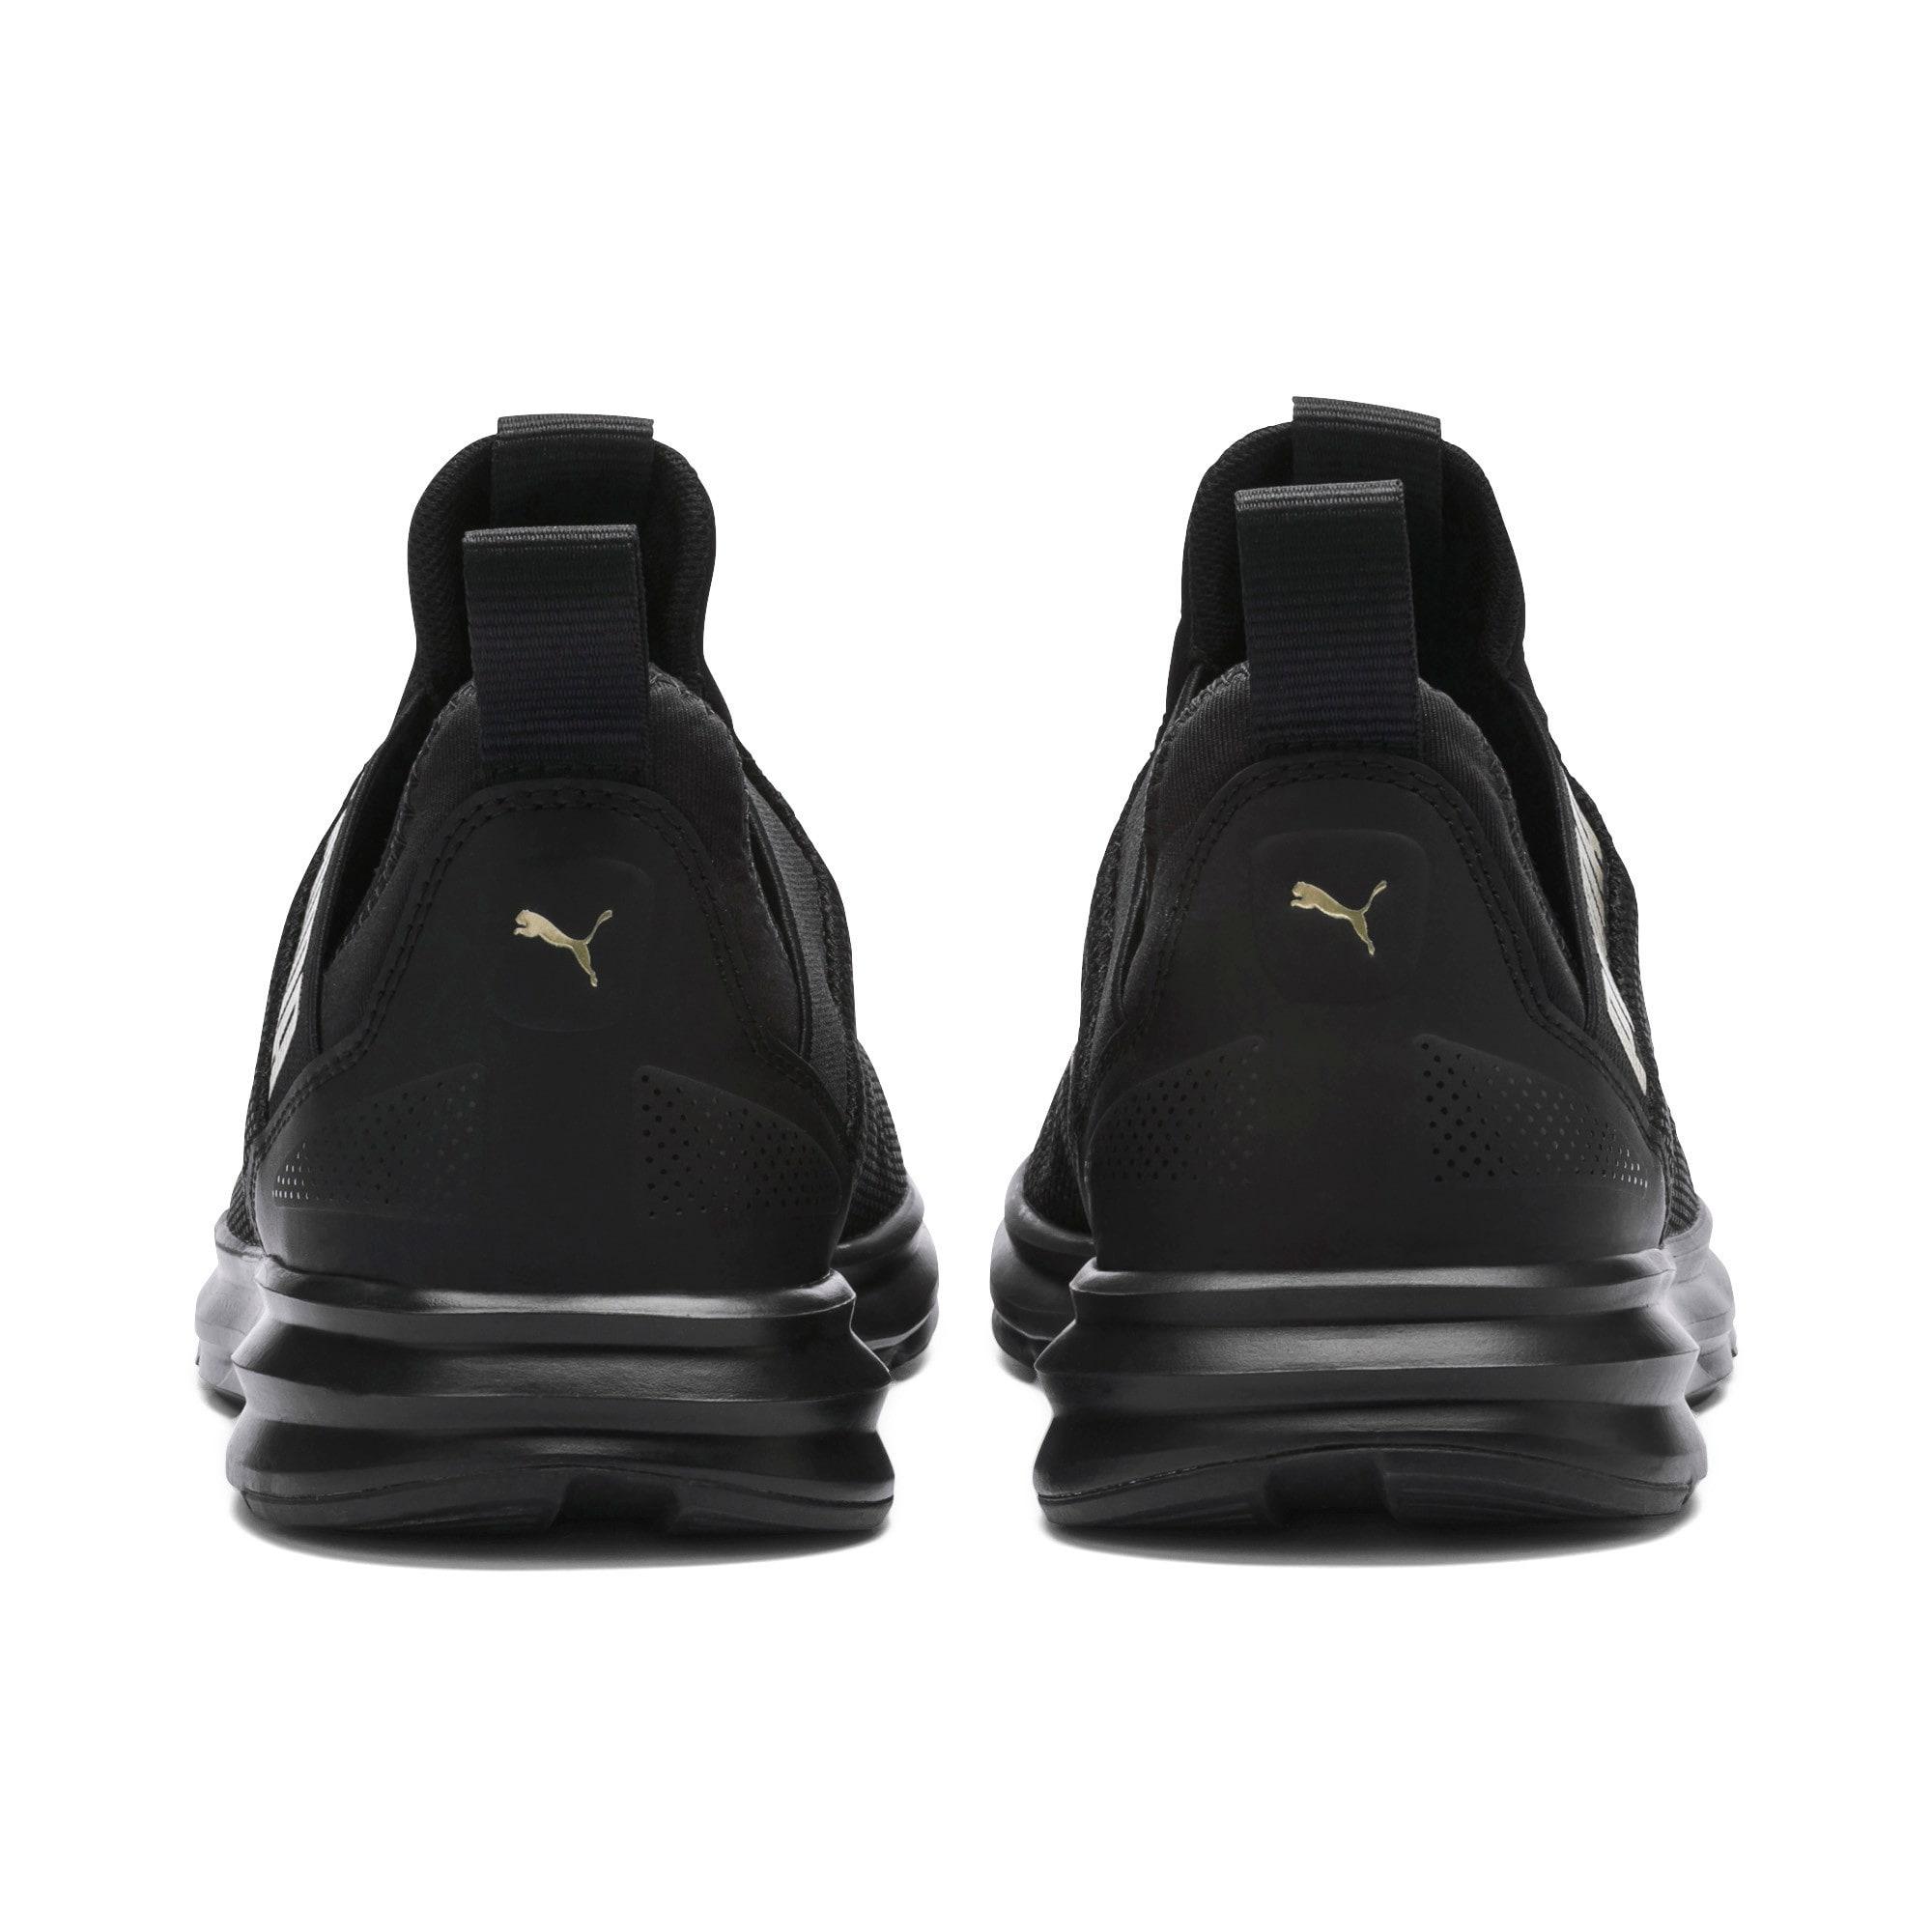 Thumbnail 3 of Enzo Beta Women's Training Shoes, Puma Black-Metallic Gold, medium